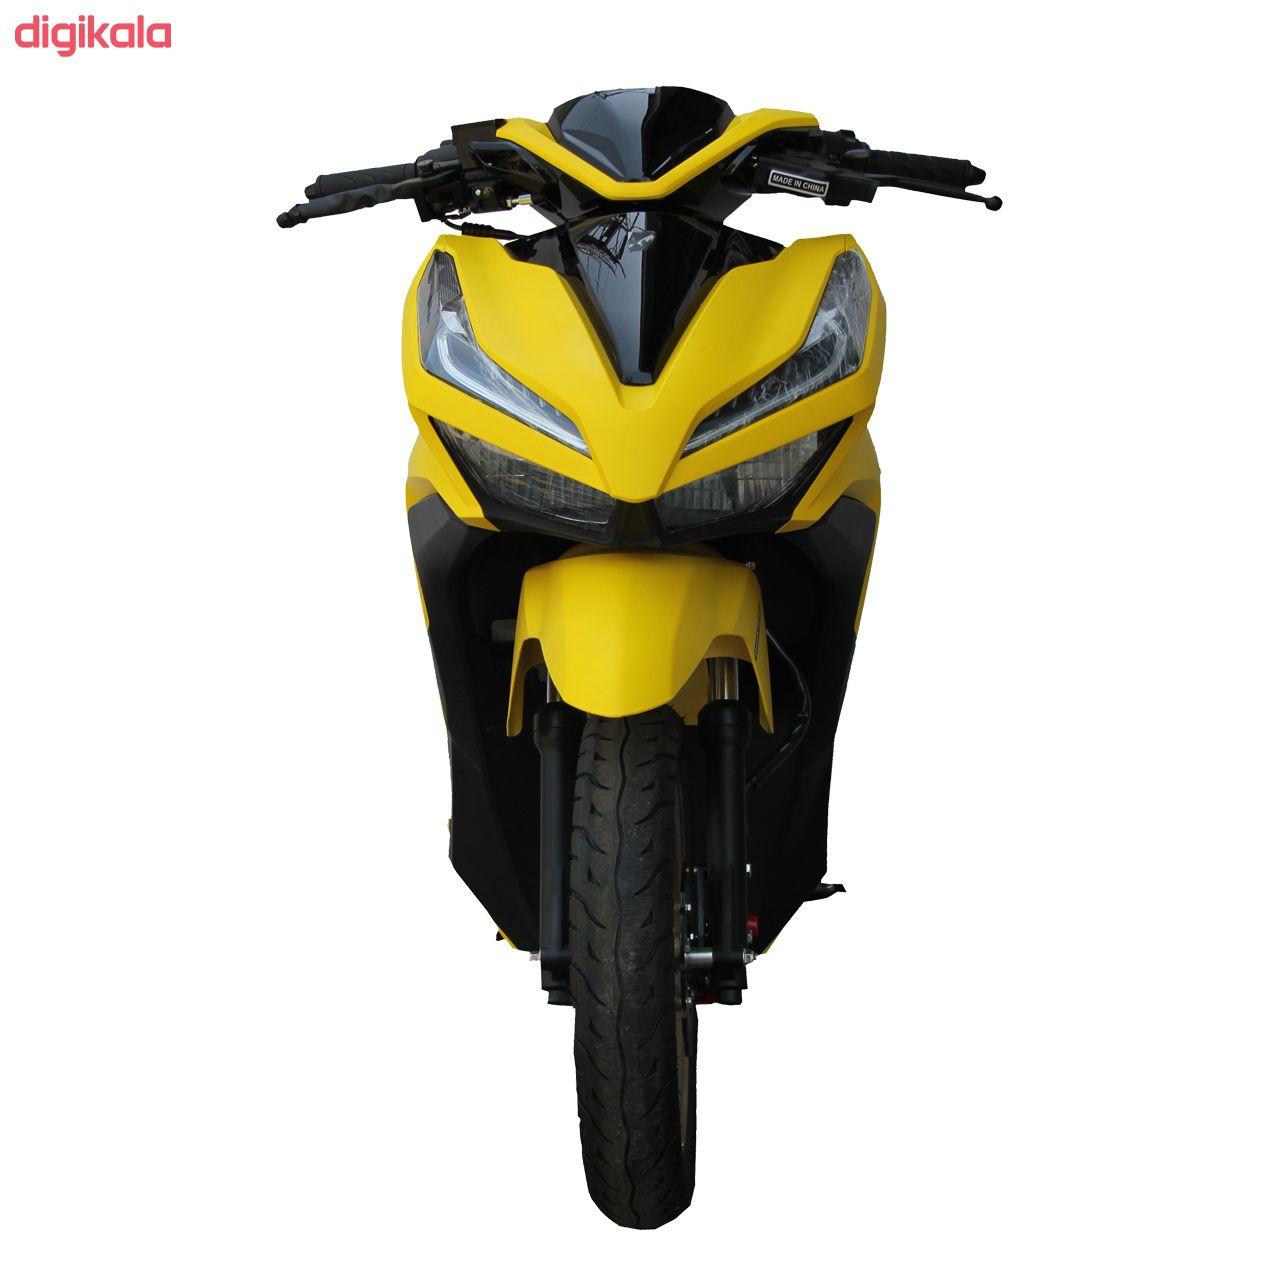 موتورسیکلت کلیک مدل هدا 150 سی سی سال 1399 main 1 3